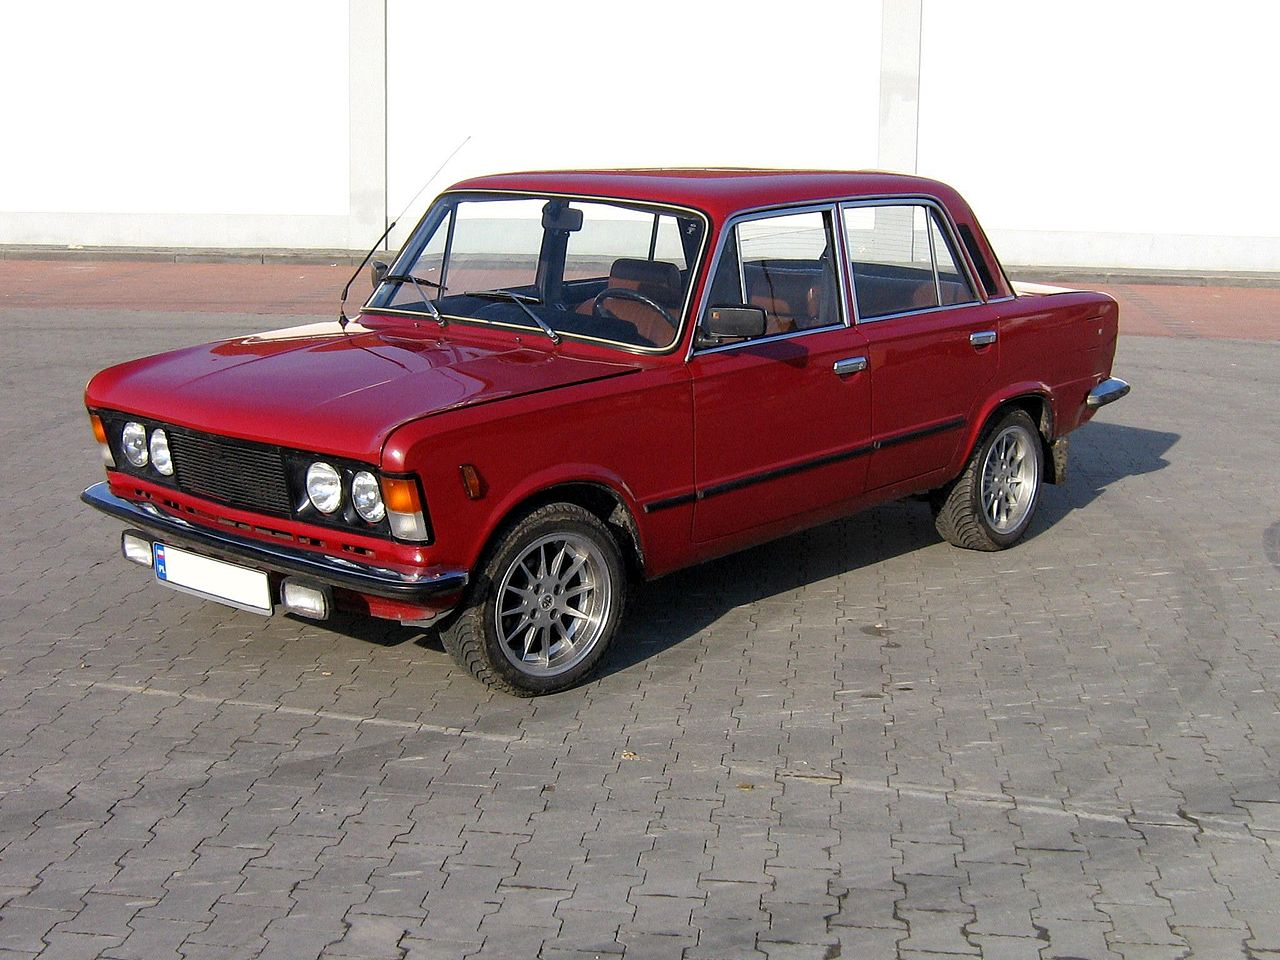 FIAT 125 red